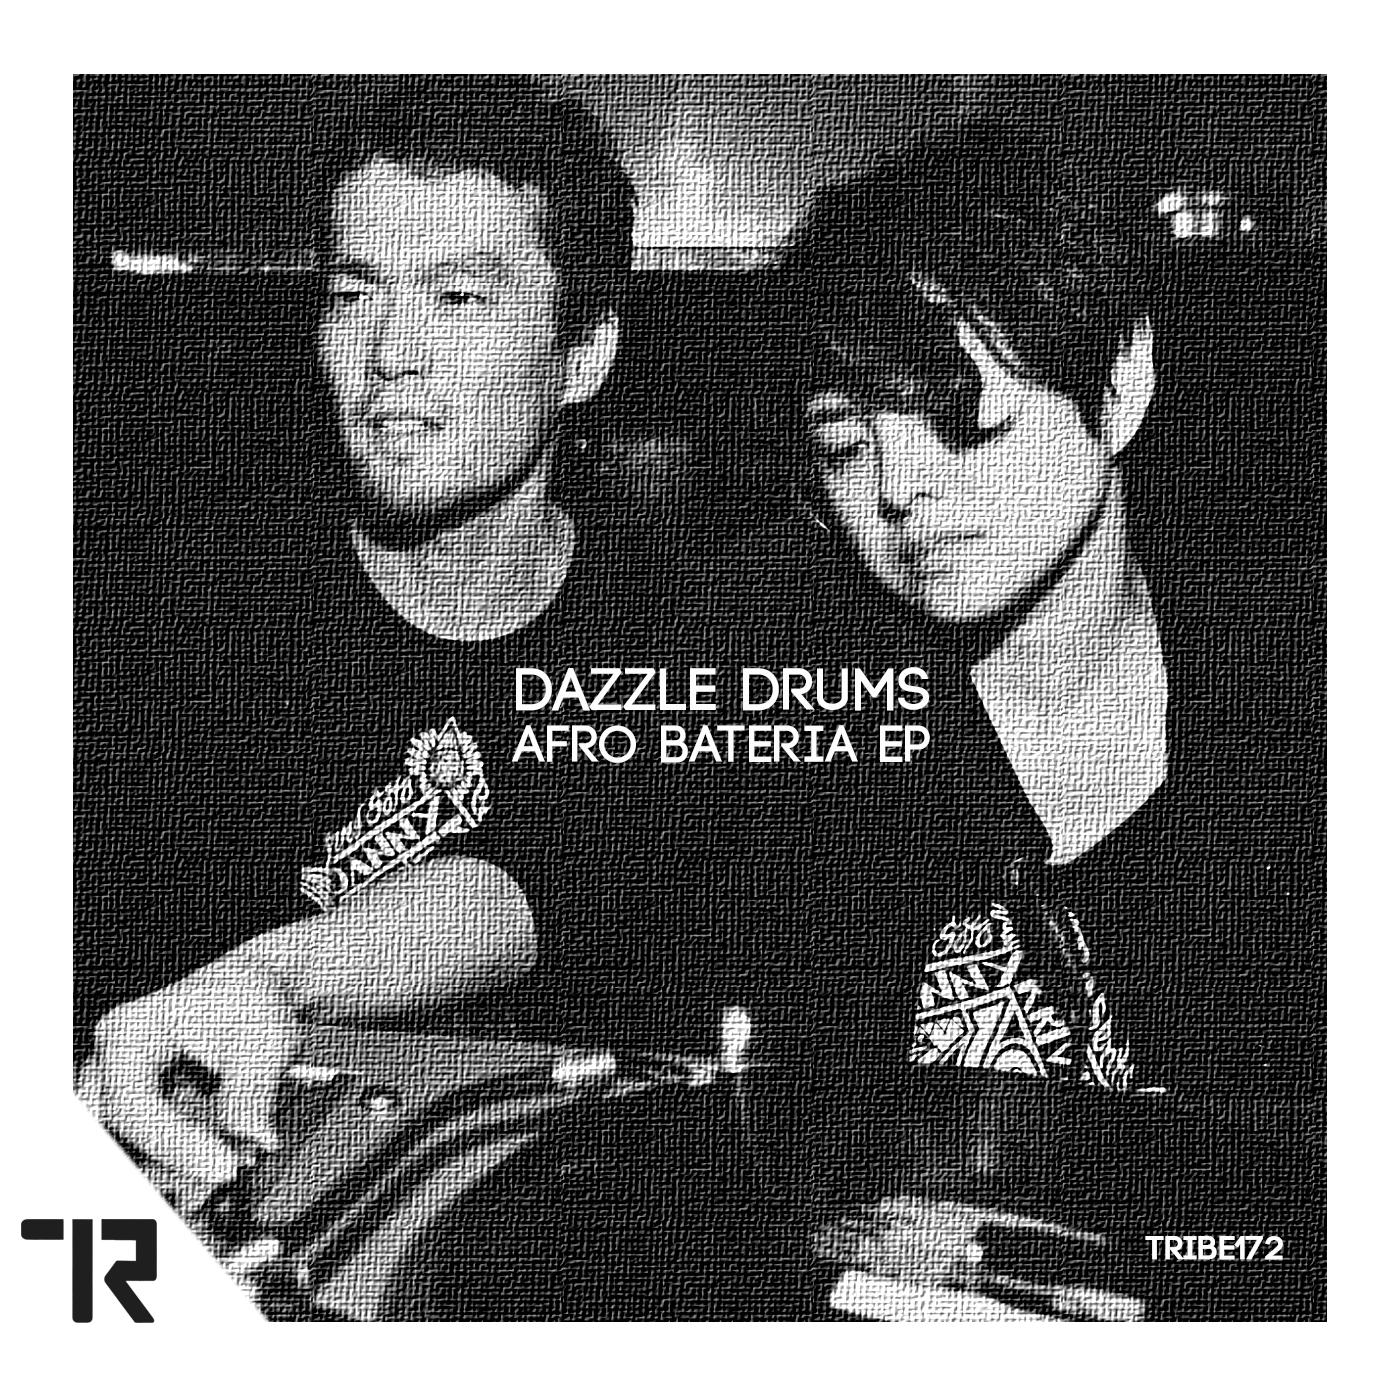 DAZZLE DRUMS              AFRO BATERIA EP